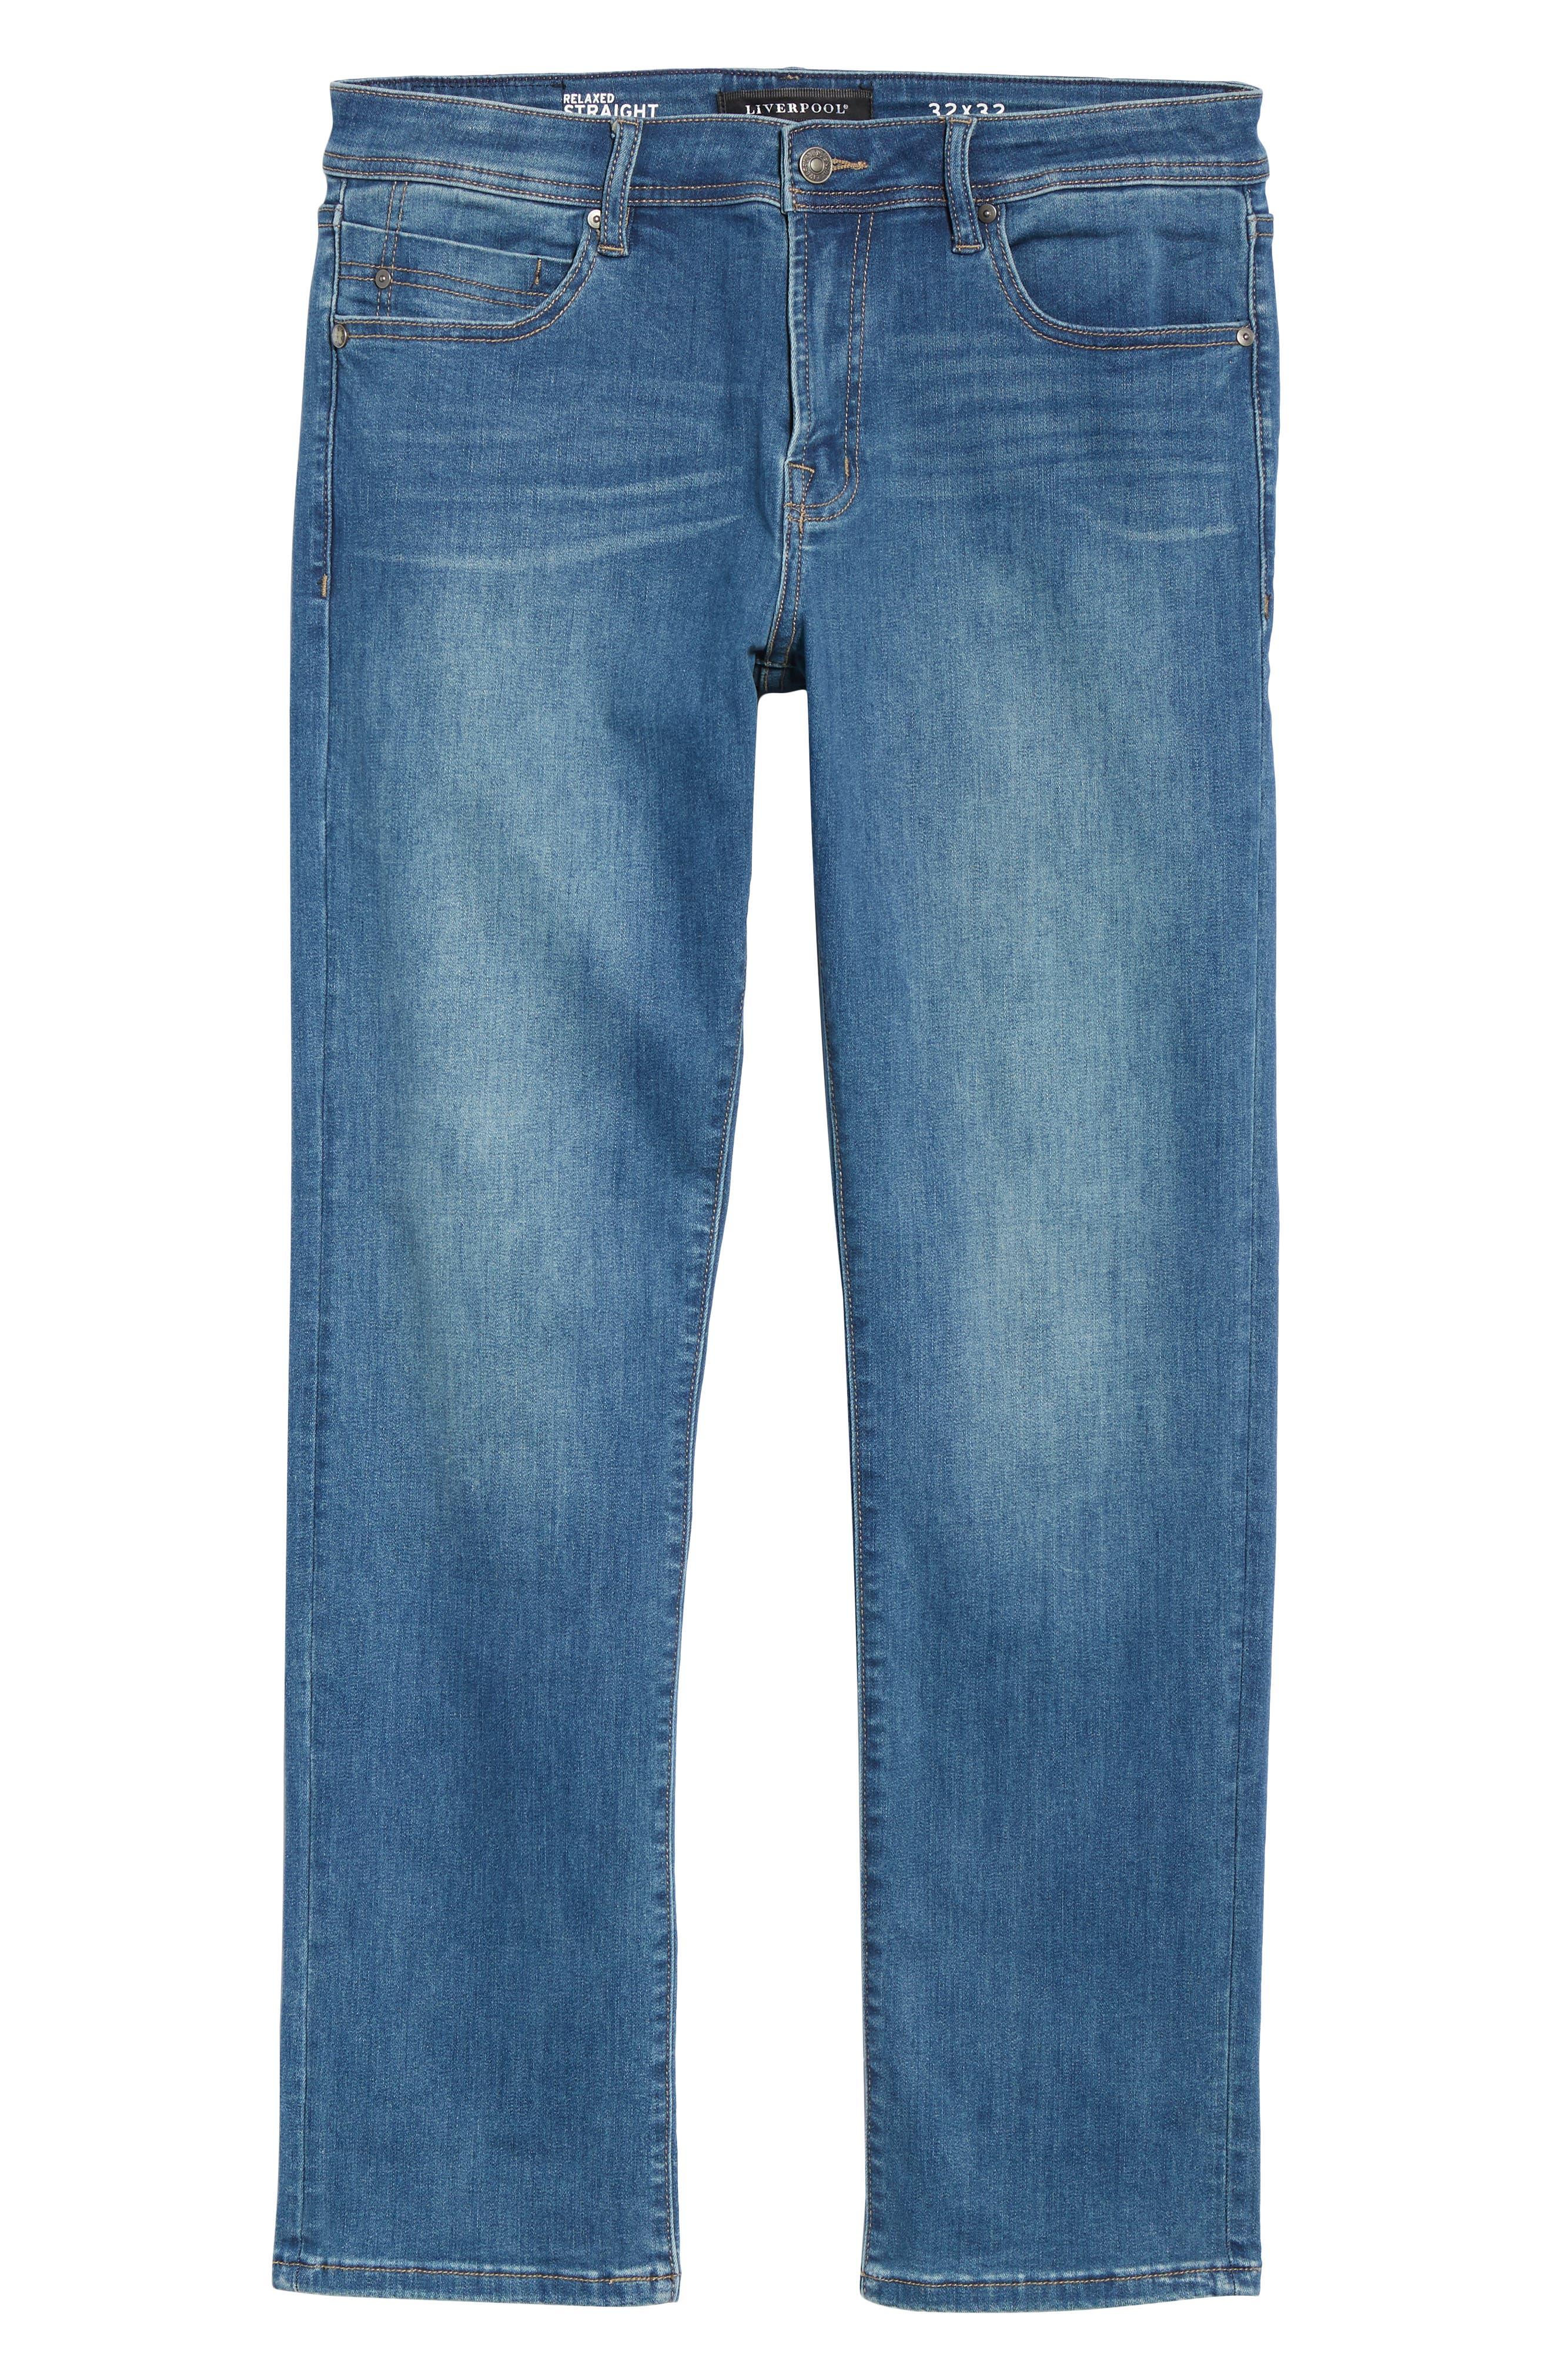 Regent Relaxed Straight Leg Jeans,                             Alternate thumbnail 6, color,                             LORAIN